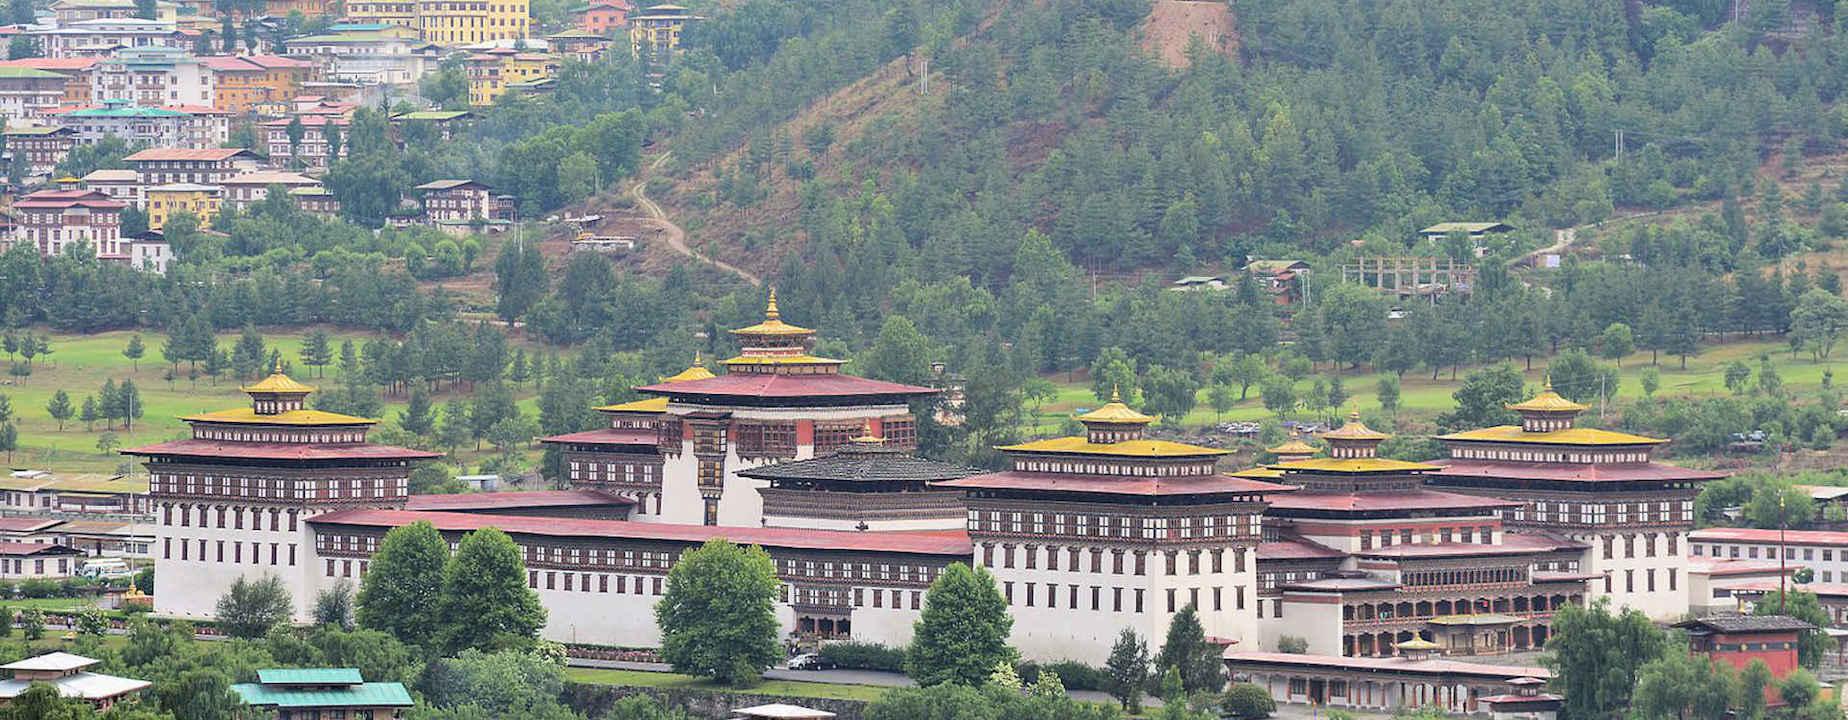 9 day Bhutan Cultural Premium Private Safari (business class flight from Bangkok included) High Season